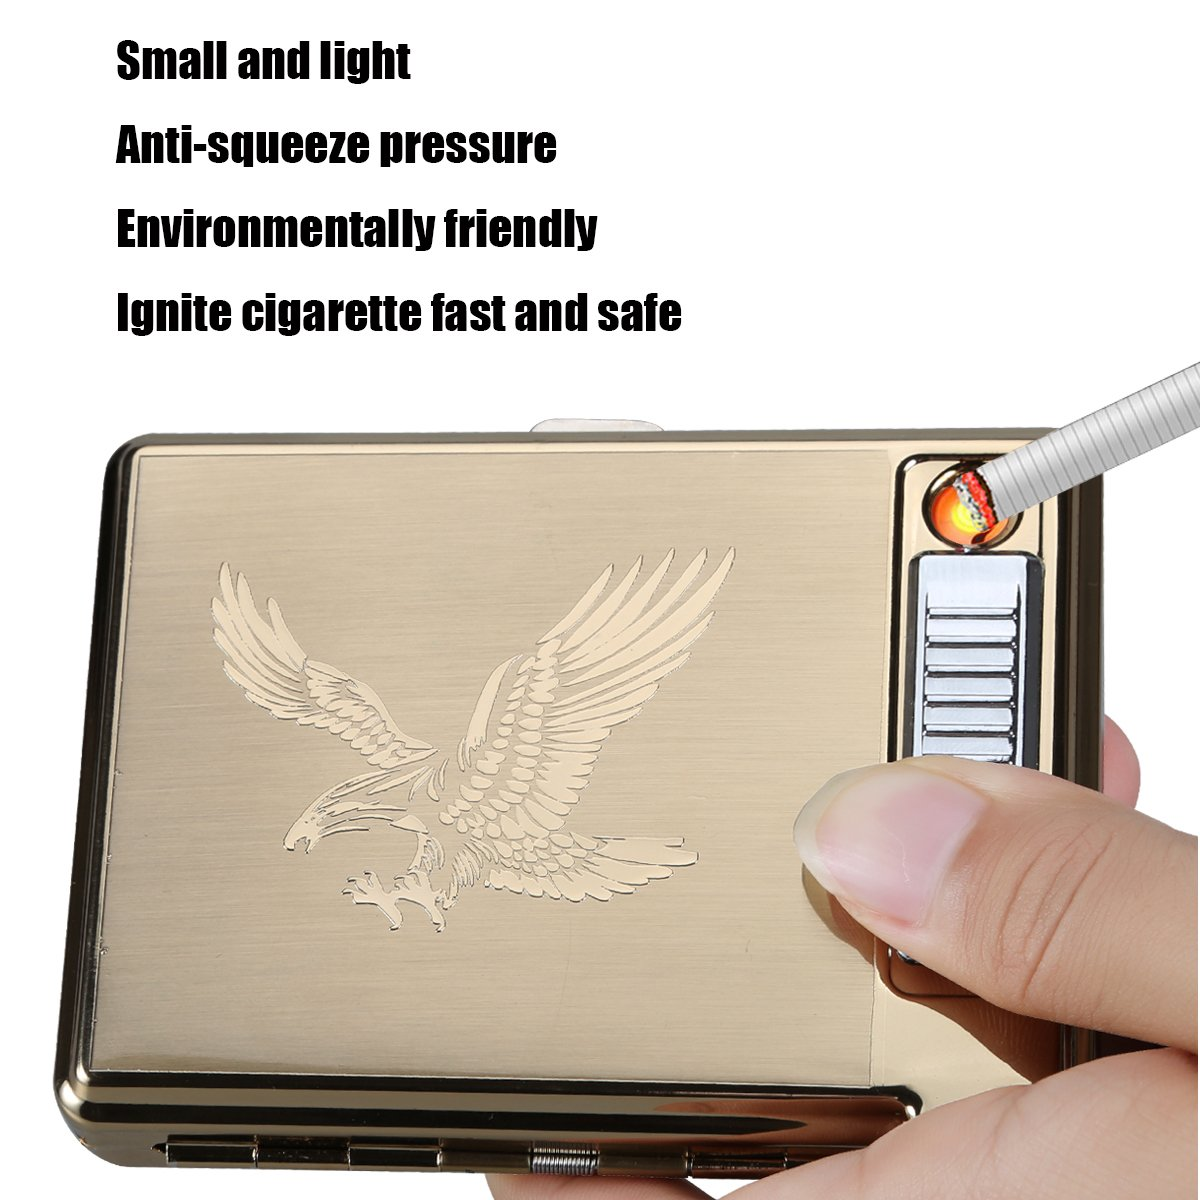 Moonwbak Cigarette Case Lighter, Metal Full Pack 20 Regular Cigarettes Box Holder USB Rechargeable Cigar Lighter Flameless Windproof with USB Cable Best for Birthday Gifts (Eagle)